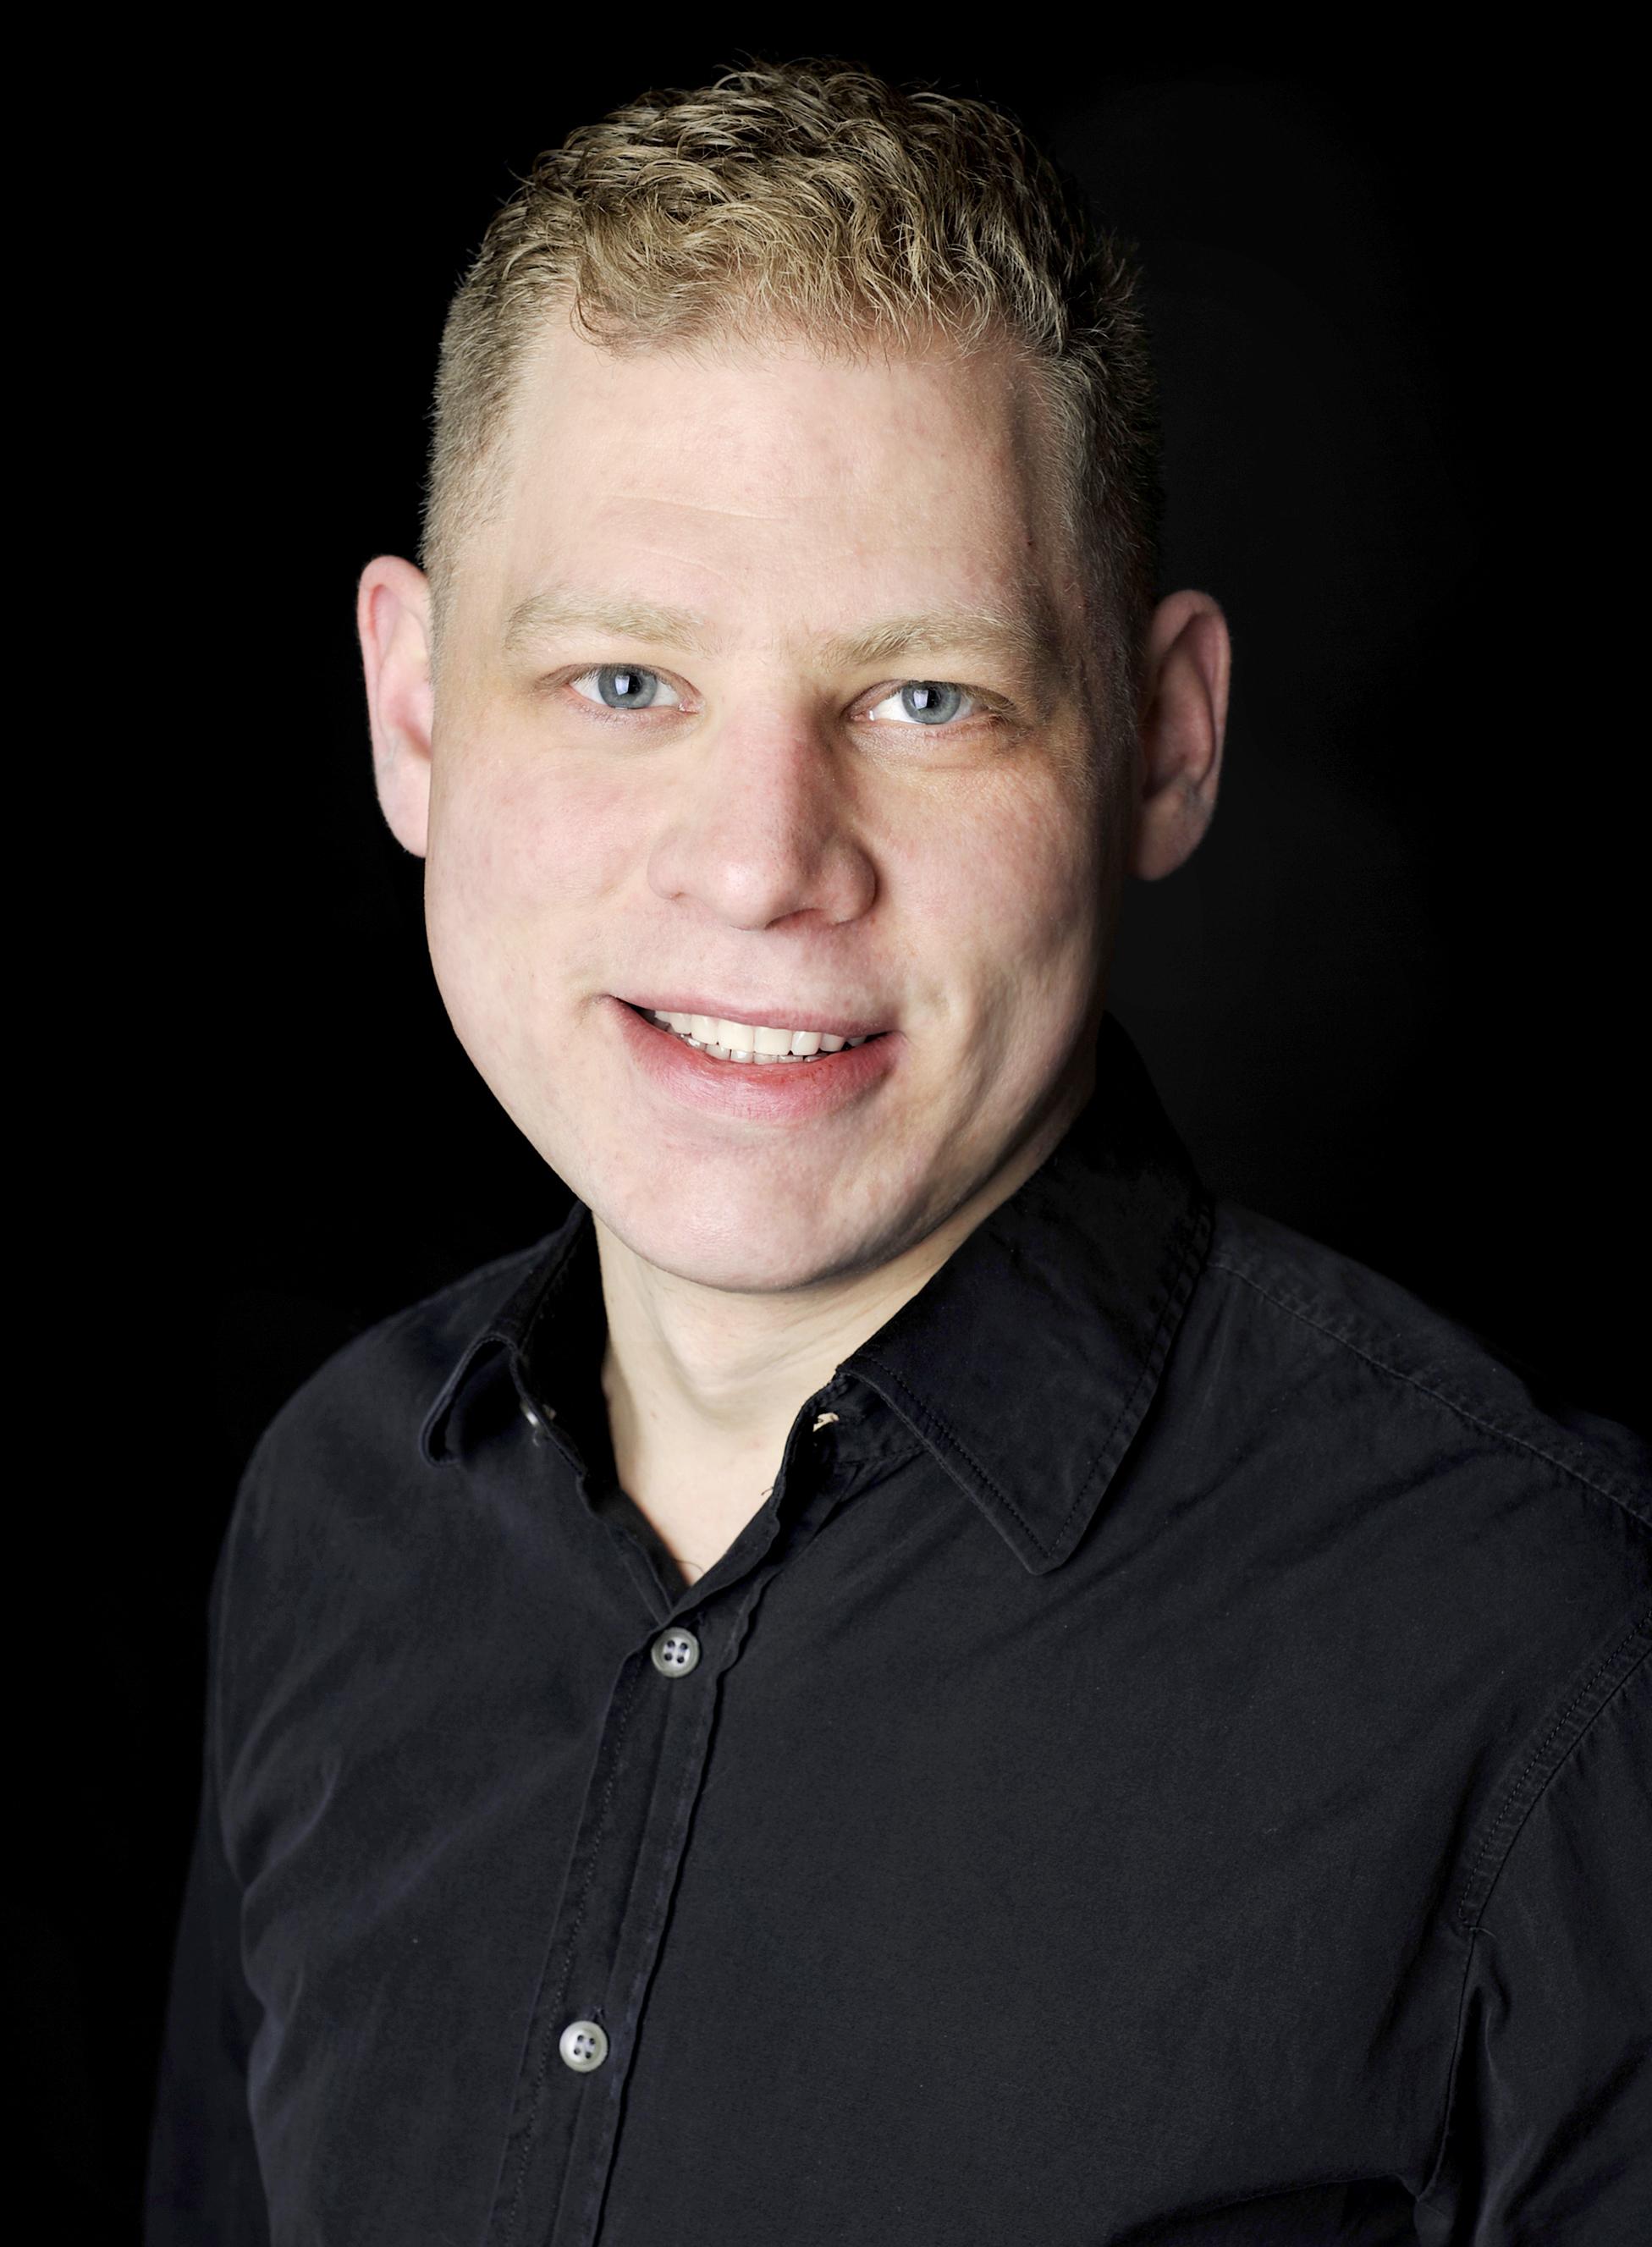 Robert van der Wolk